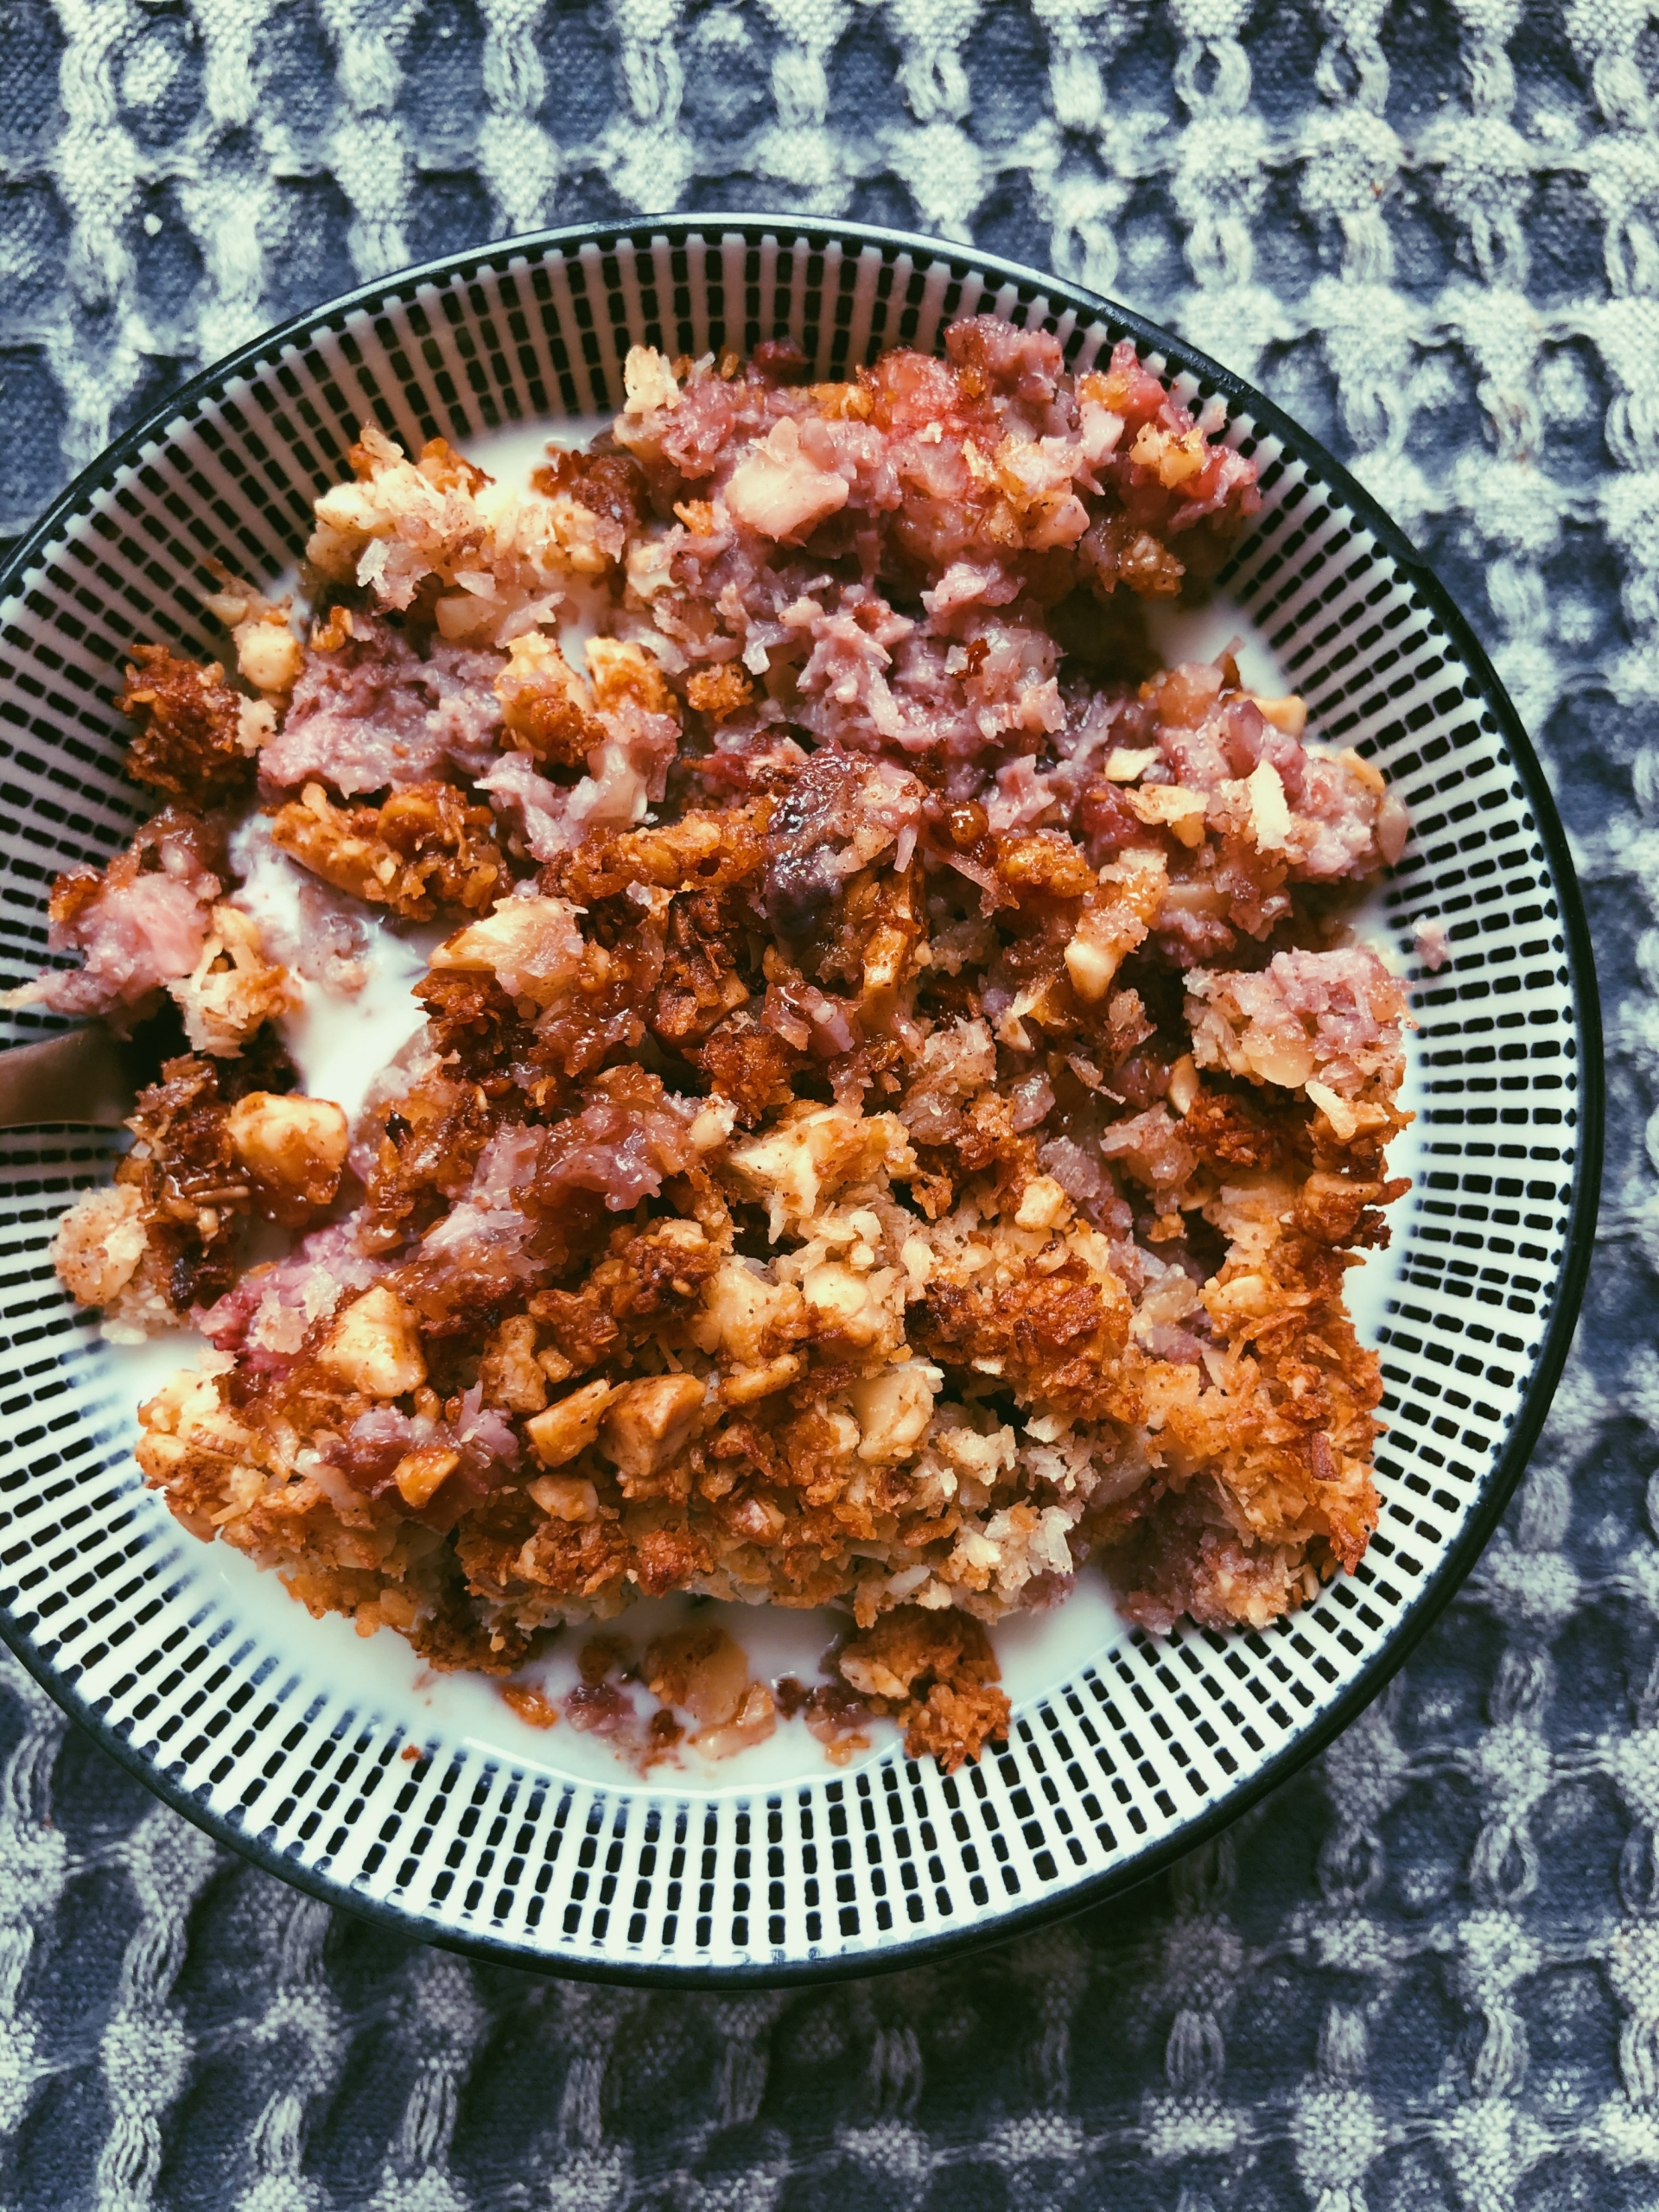 peach-strawberry cobbler (grain free, scd diet)